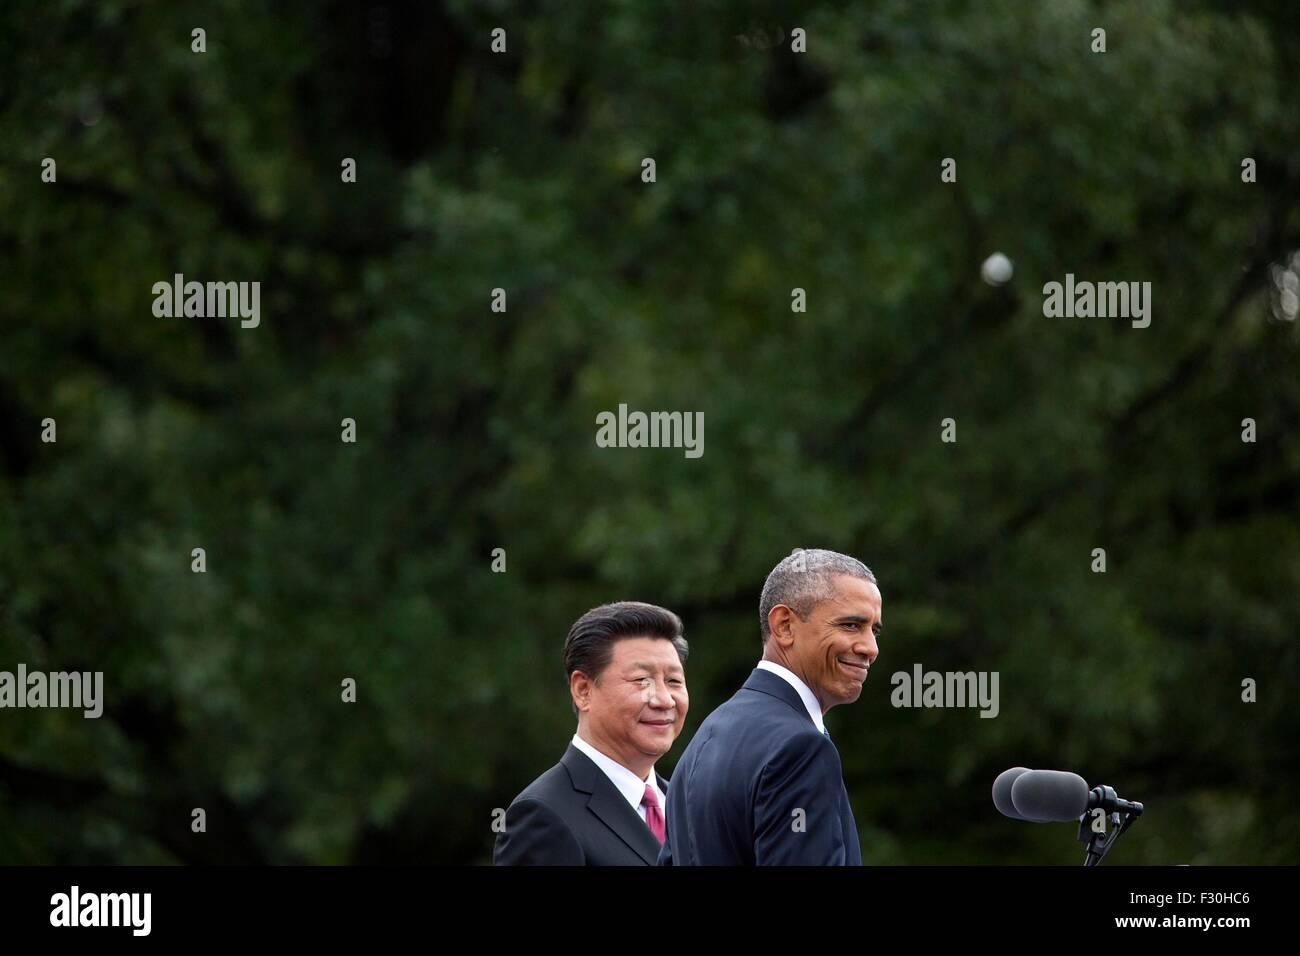 Washington DC, US. 25th Sep, 2015. U.S. President Barack Obama and Chinese President Xi Jinping smile during the - Stock Image